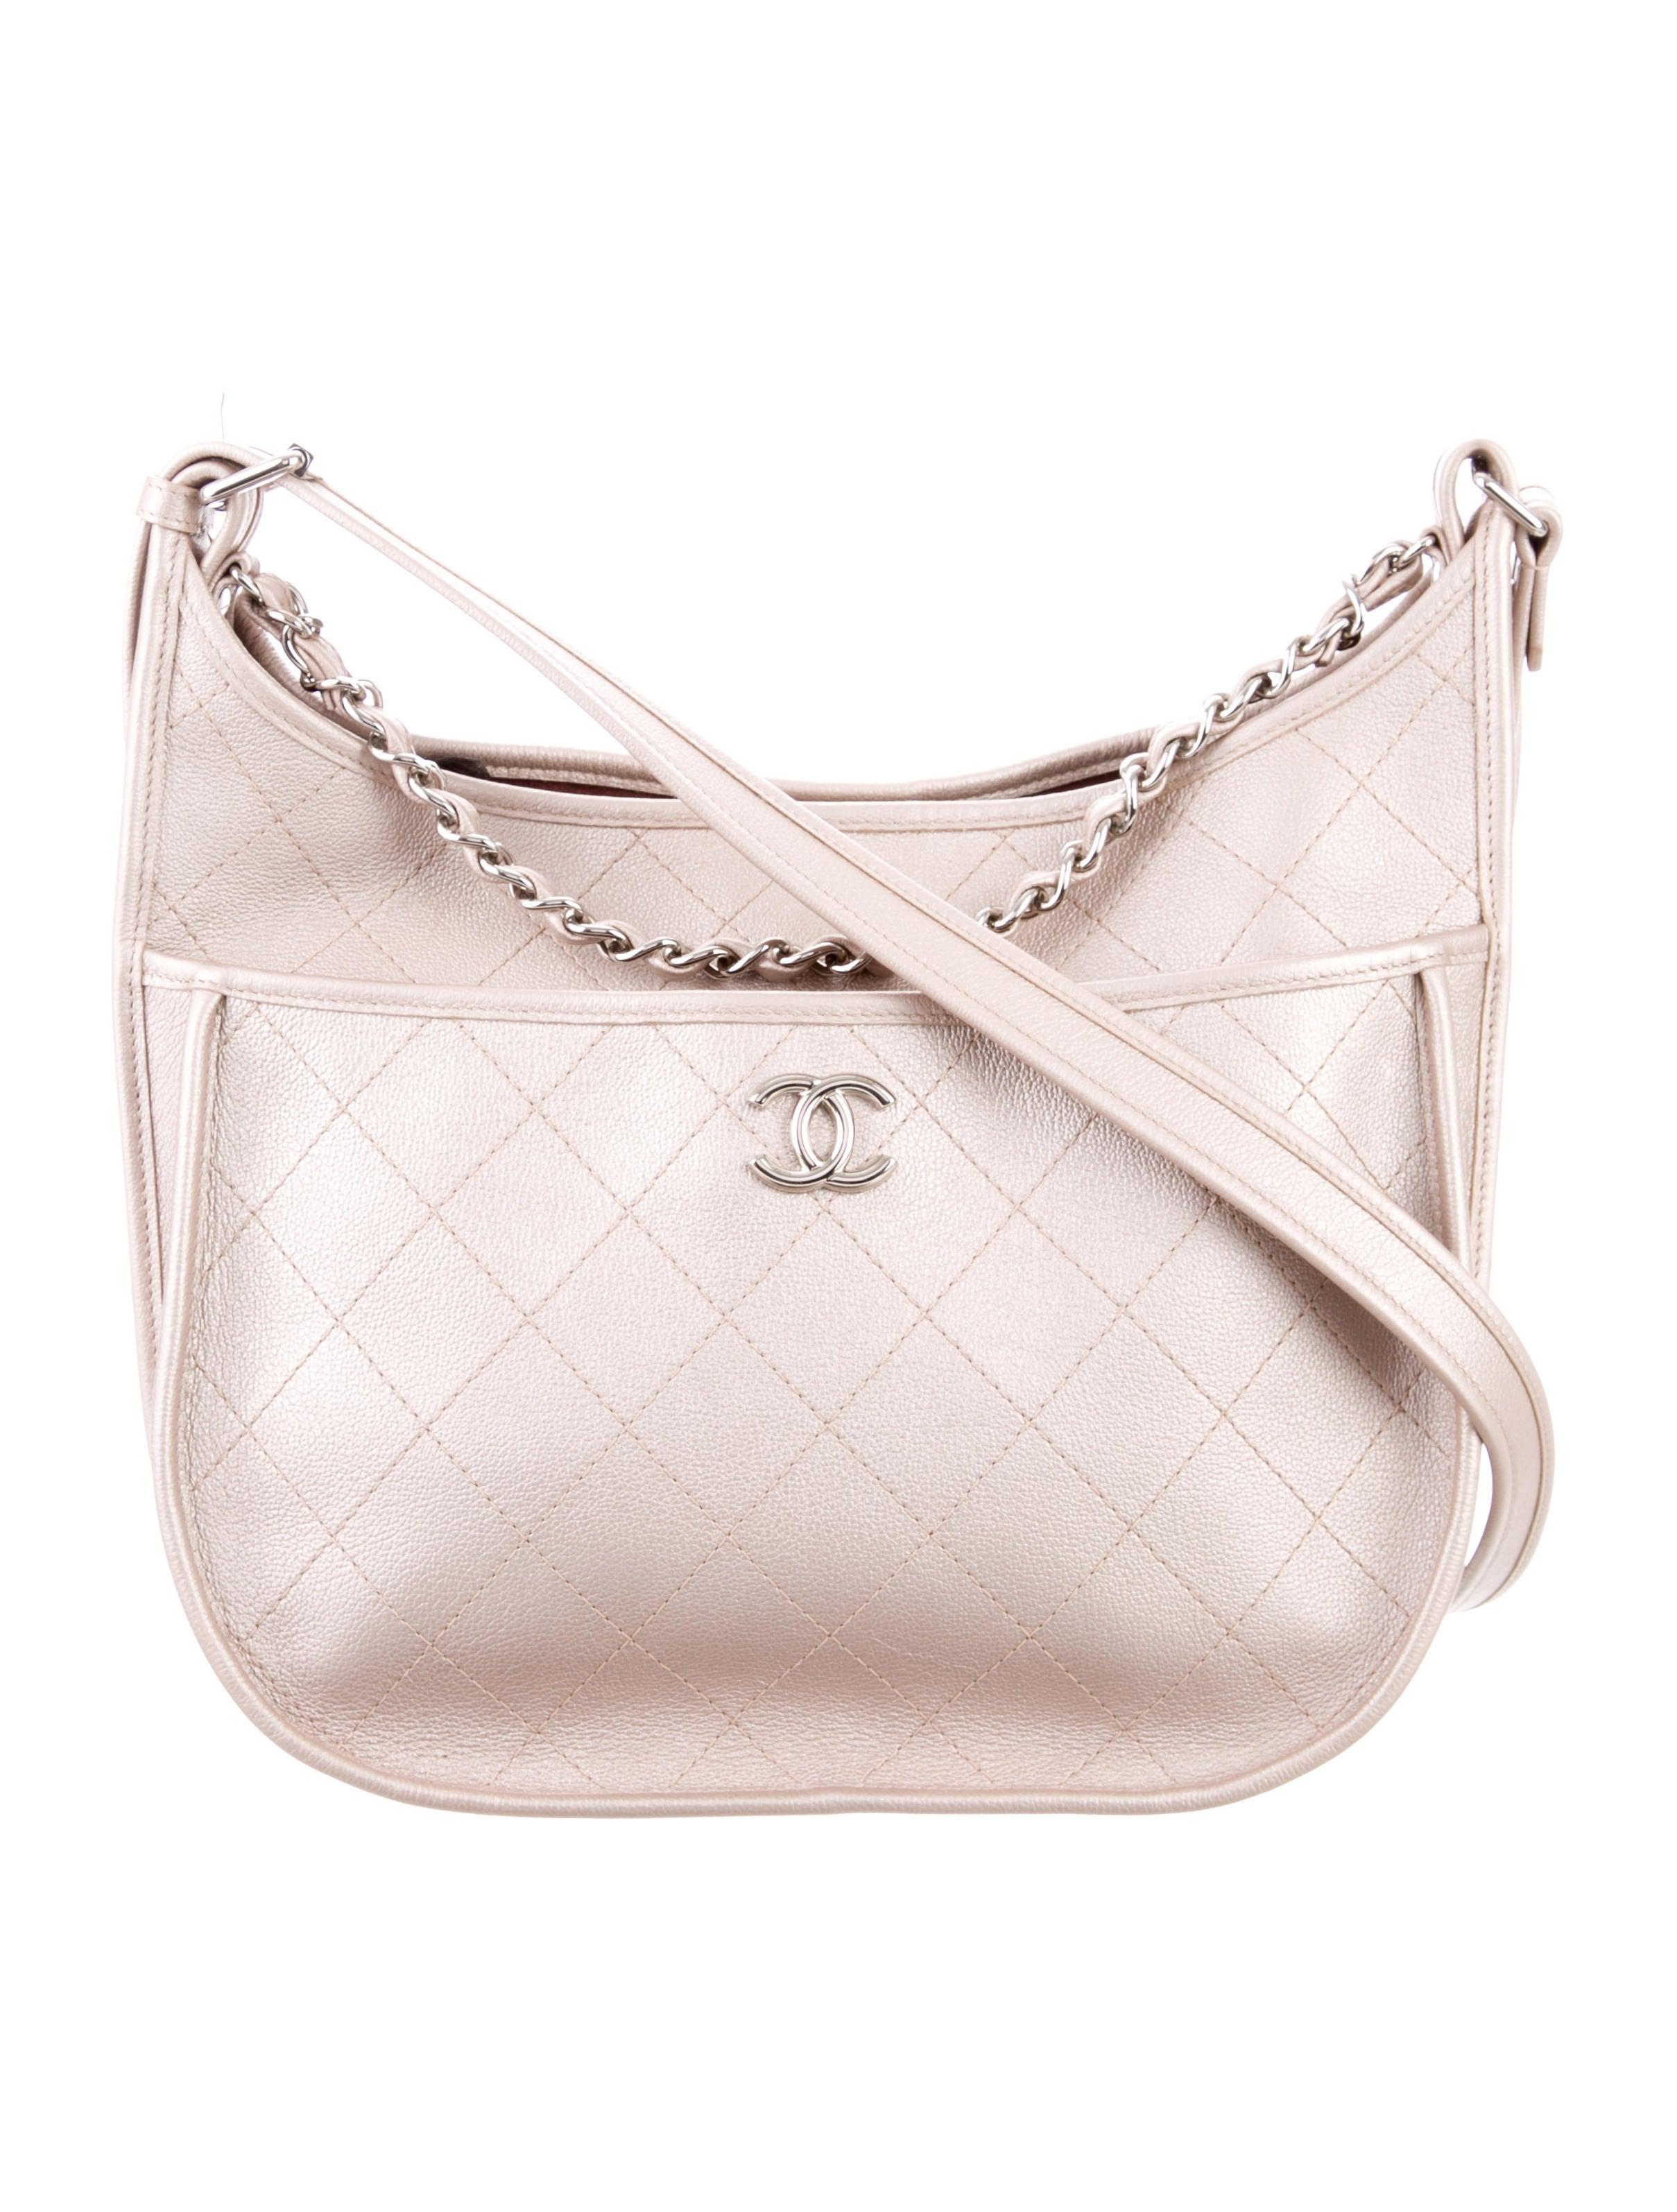 c8372fd64136 Chanel 2018 Medium Jungle Stroll Crossbody - Handbags - CHA274086 ...